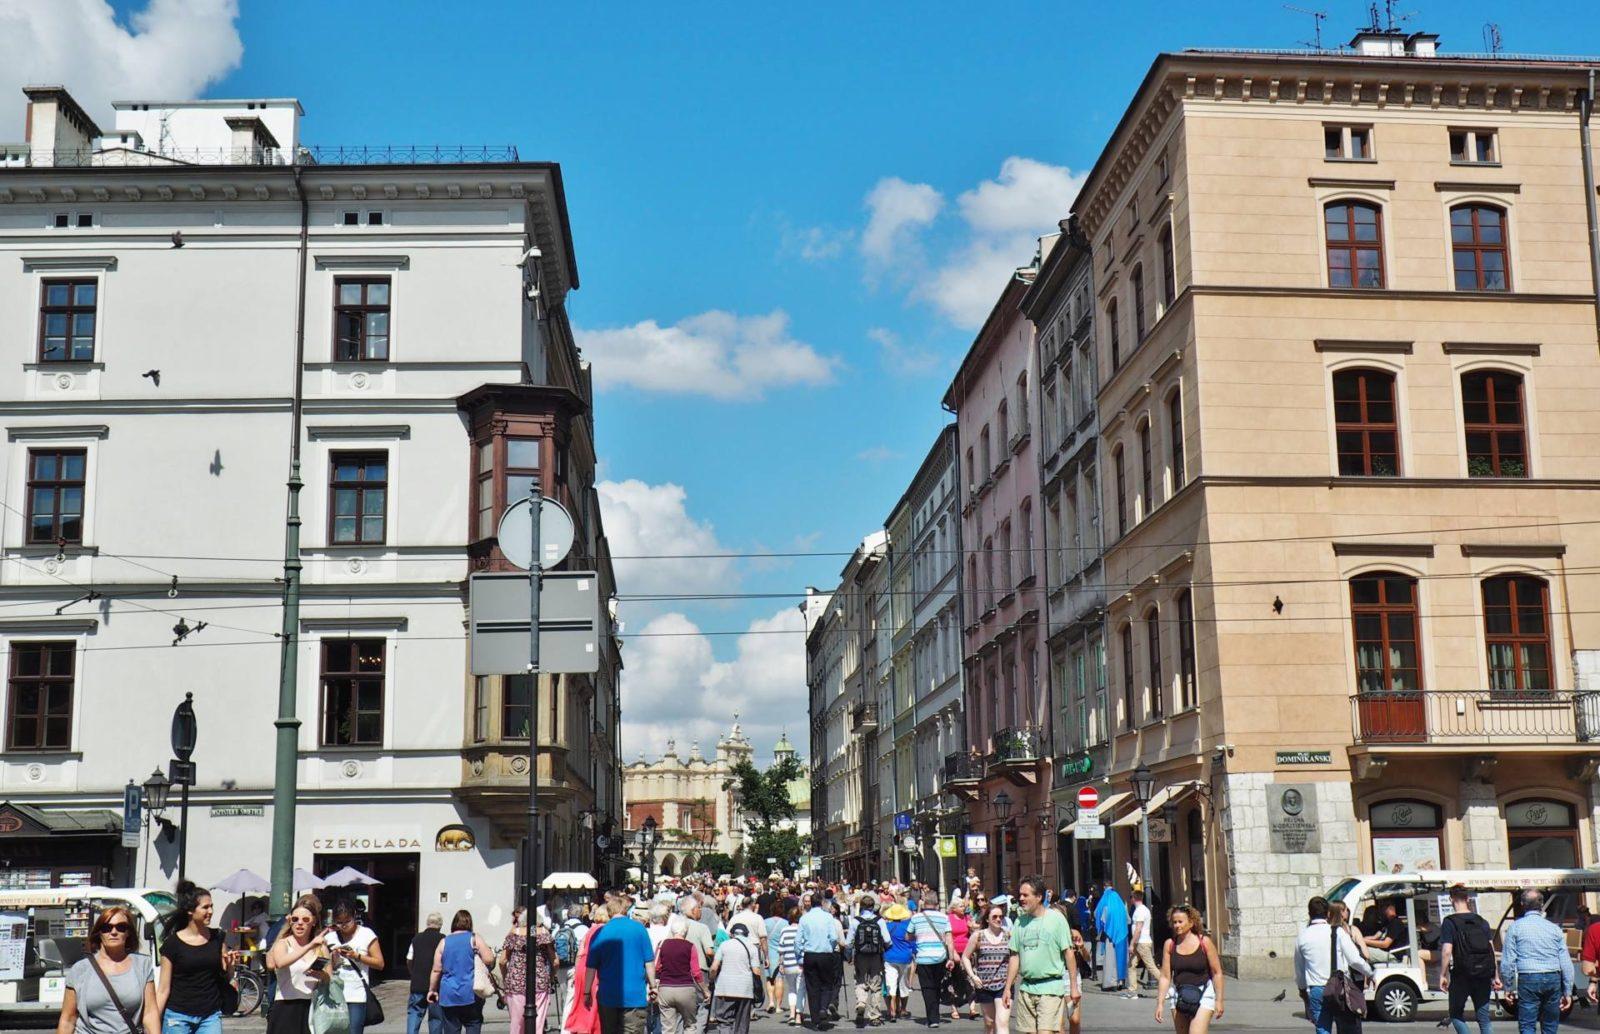 Emma Victoria Stokes Krakow High Street